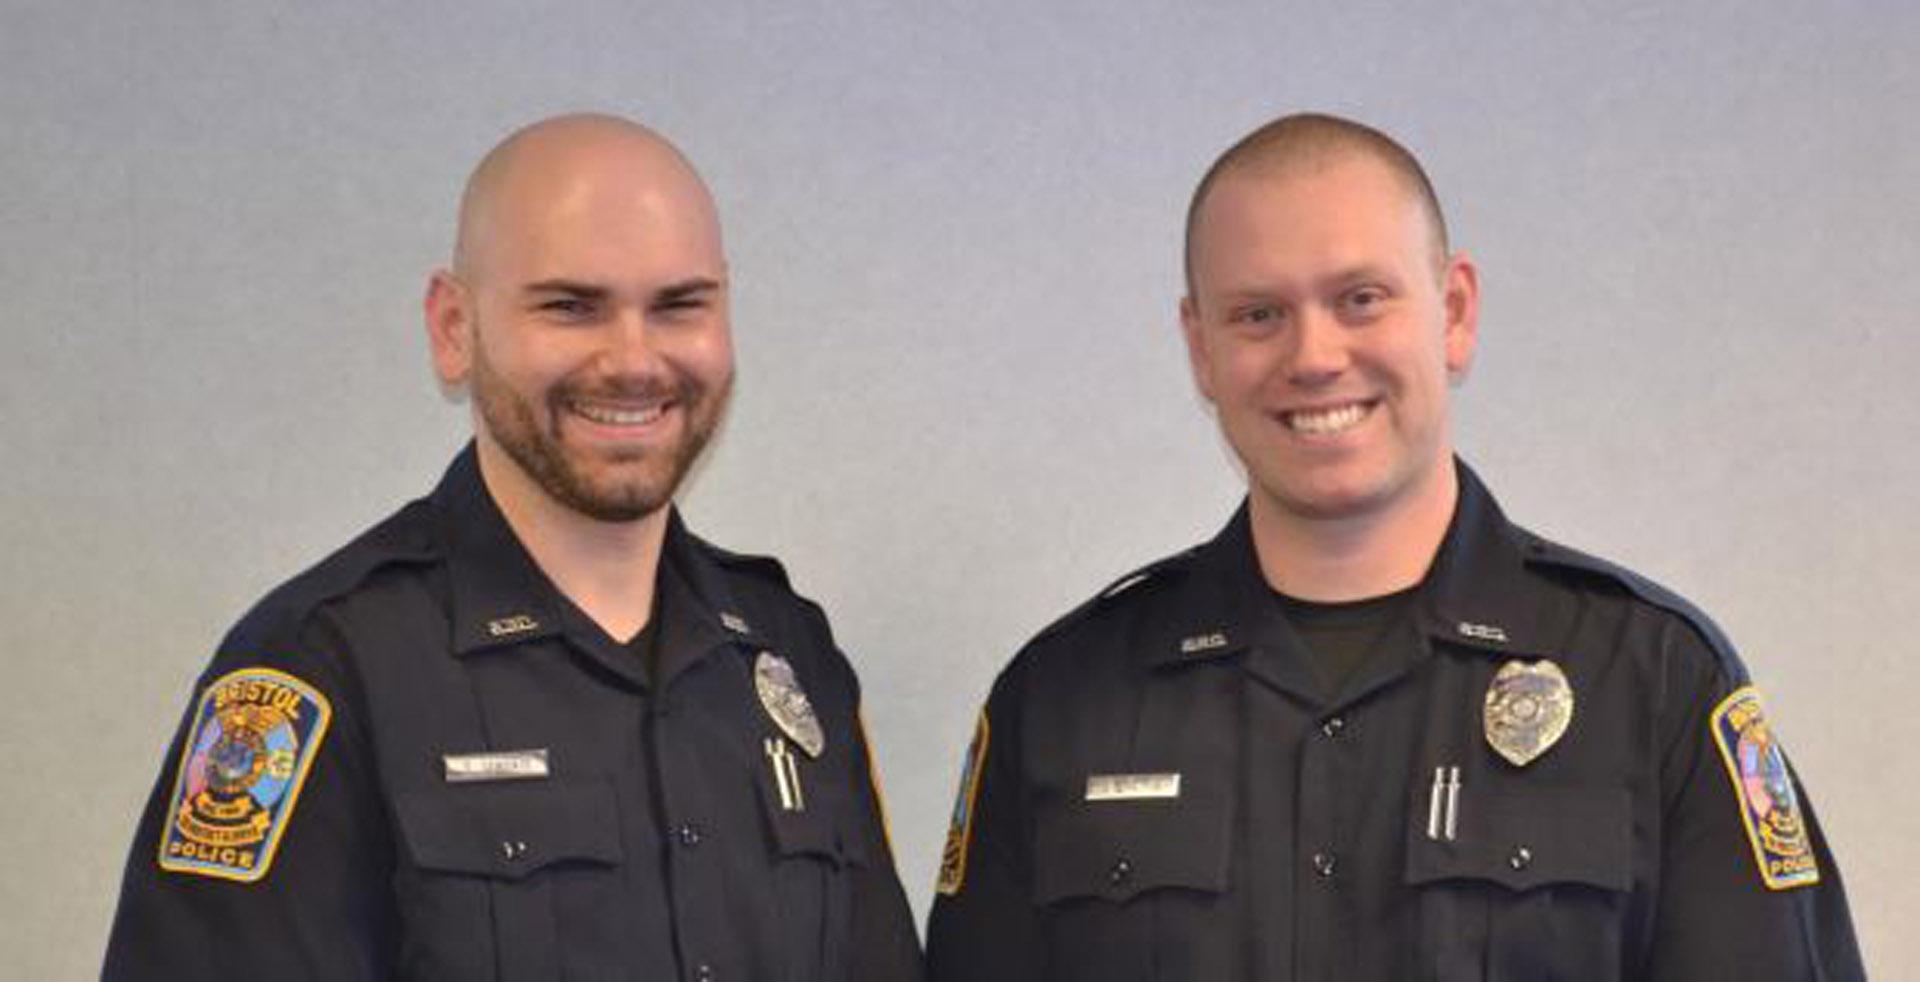 bristol officers save man's life.jpg